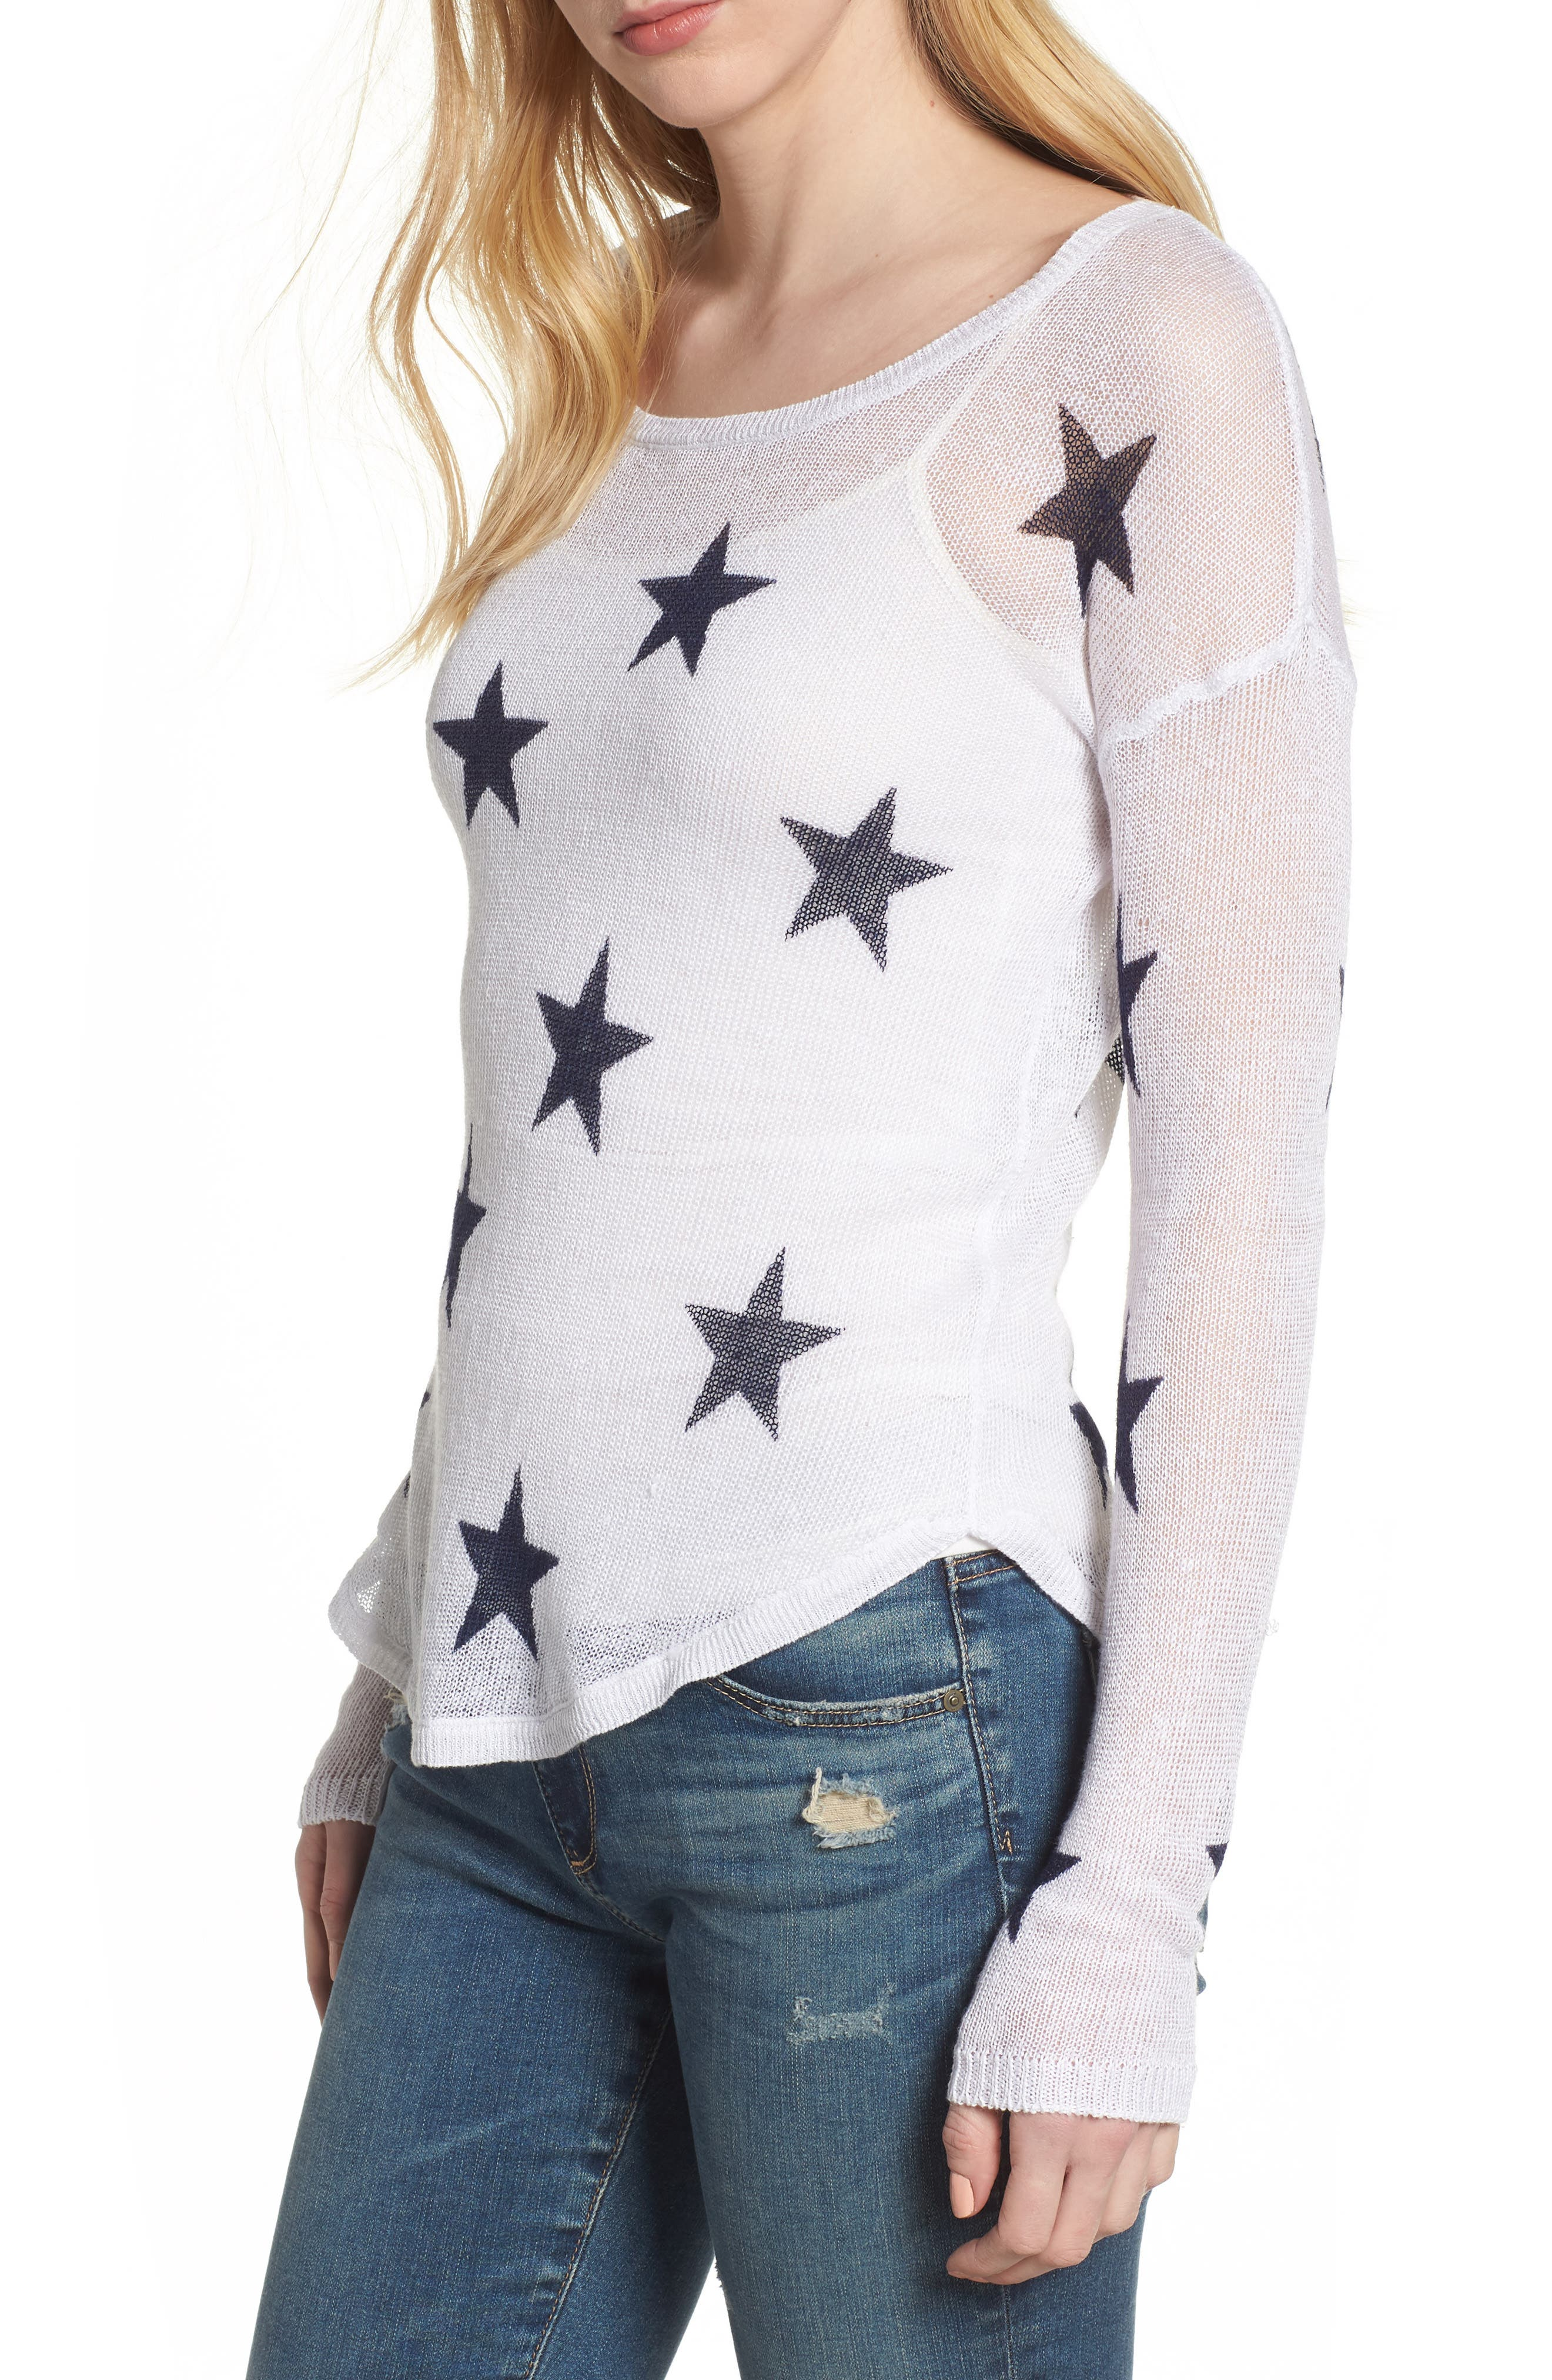 Perri Linen Sweater,                         Main,                         color, White Navy Stars